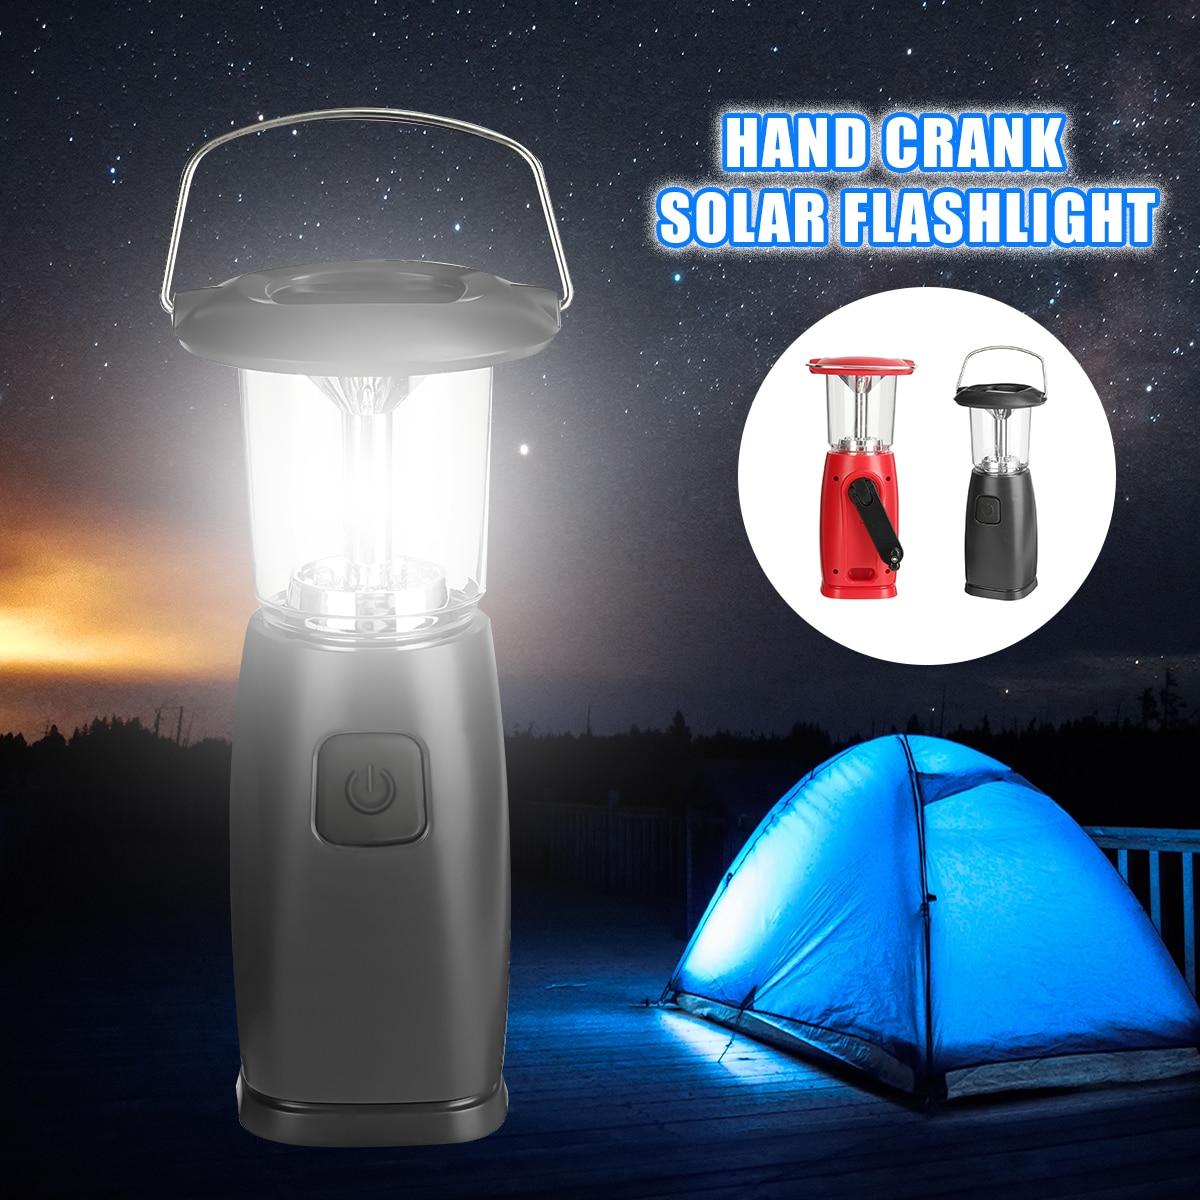 Smuxi LED Hand Flashlight Rechargeable Led Emergency Light 6 High Brightness Crank Solar Camping Traveling Lamp Light